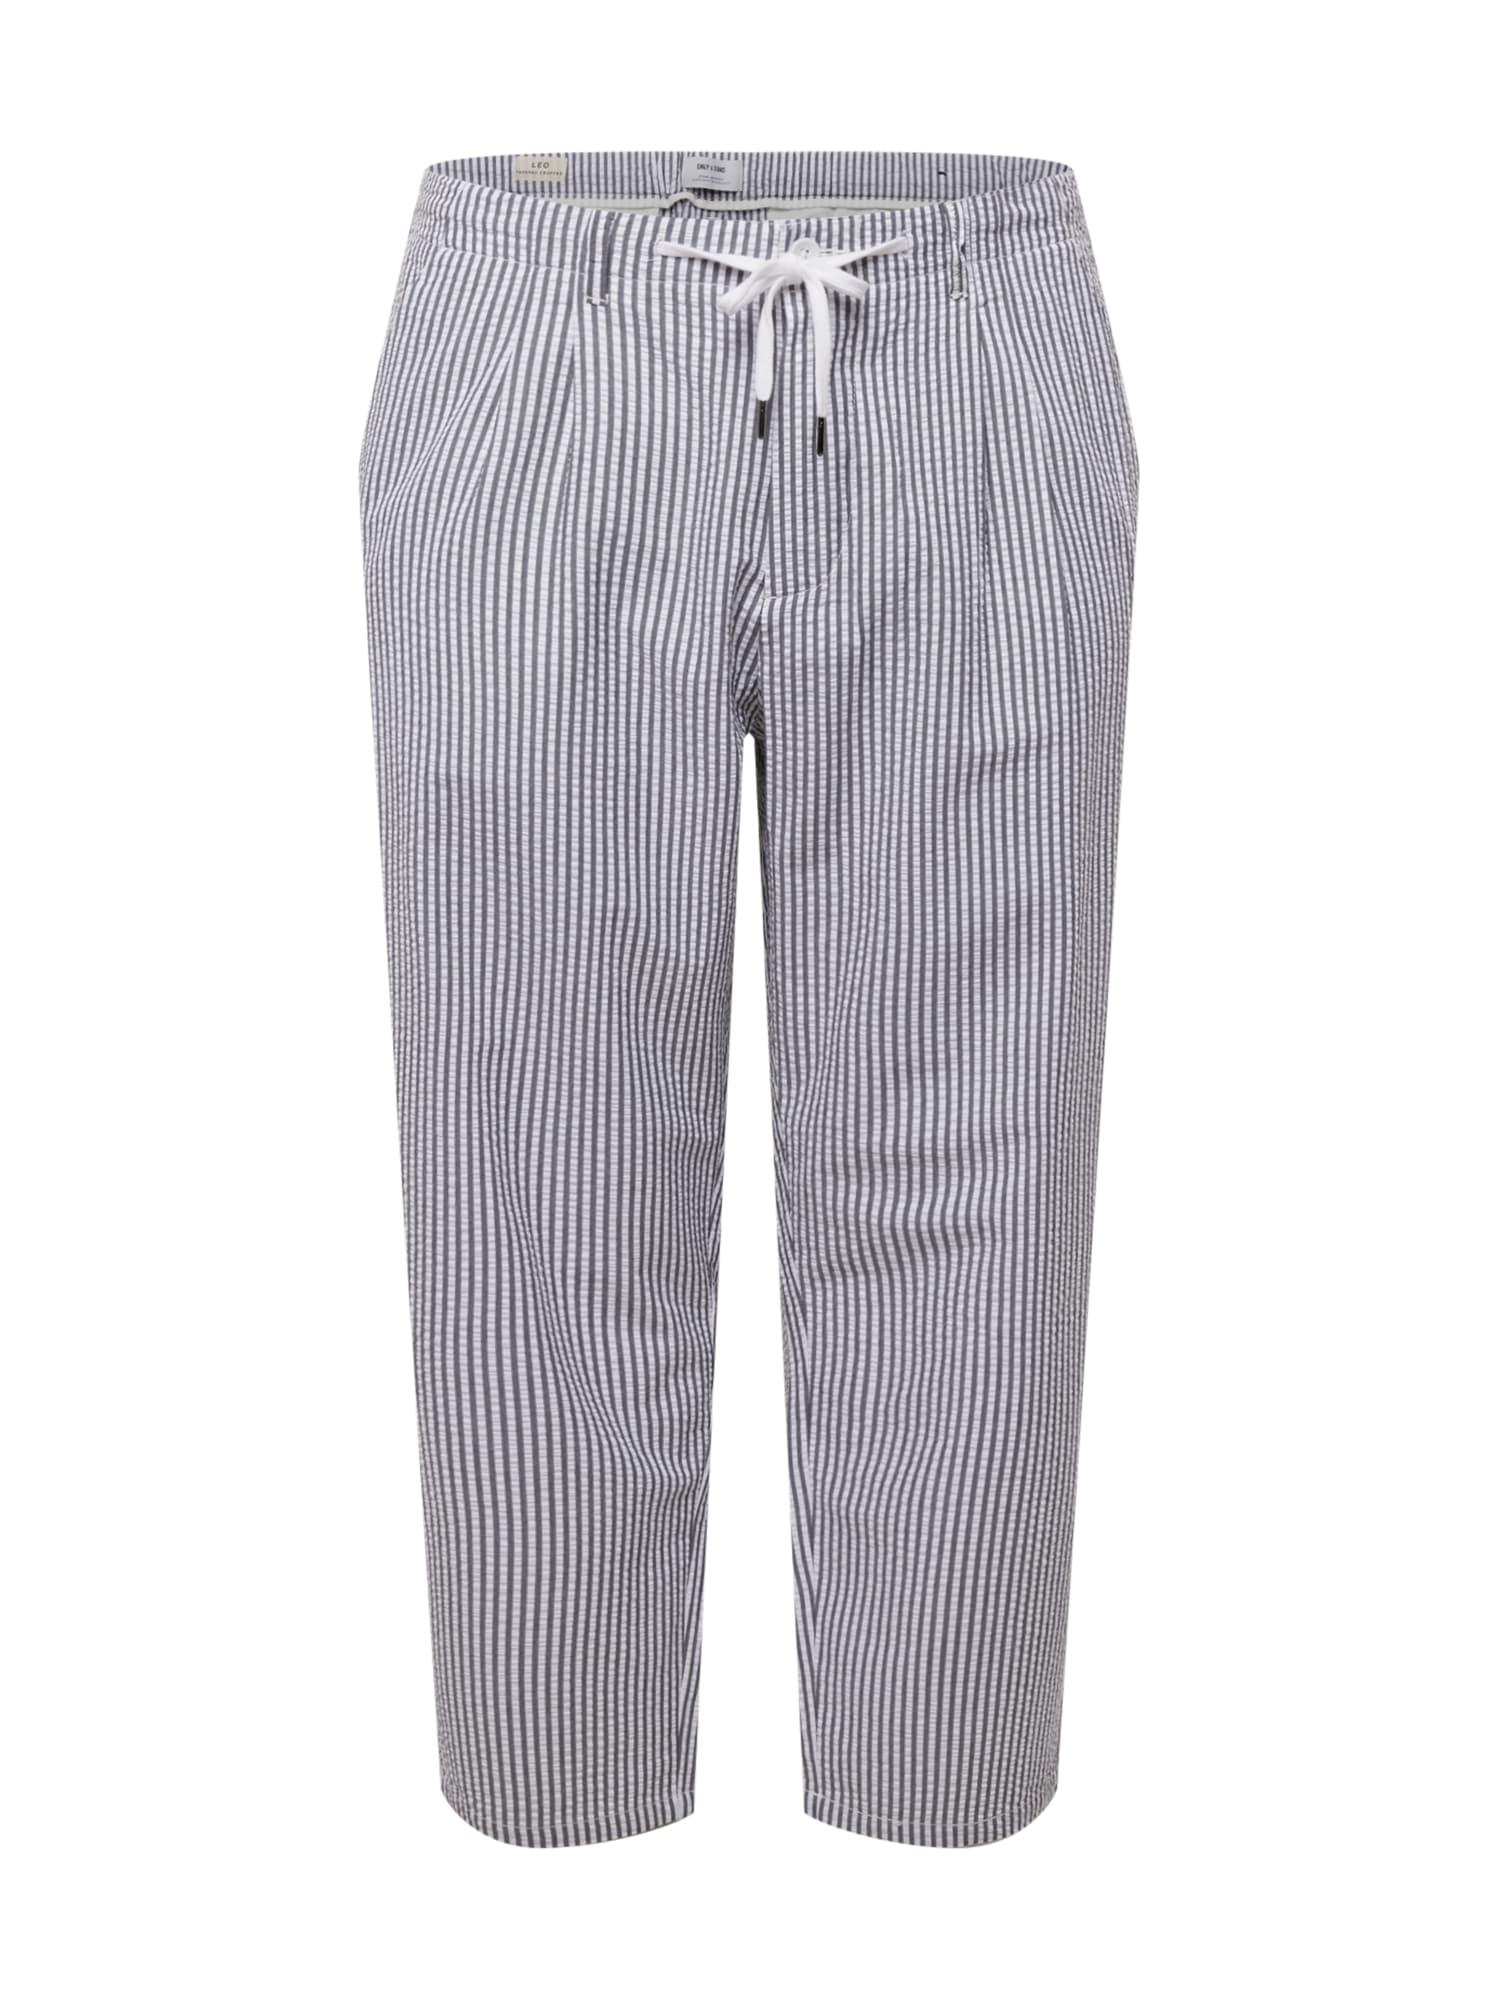 Only & Sons Big & Tall Klostuotos kelnės